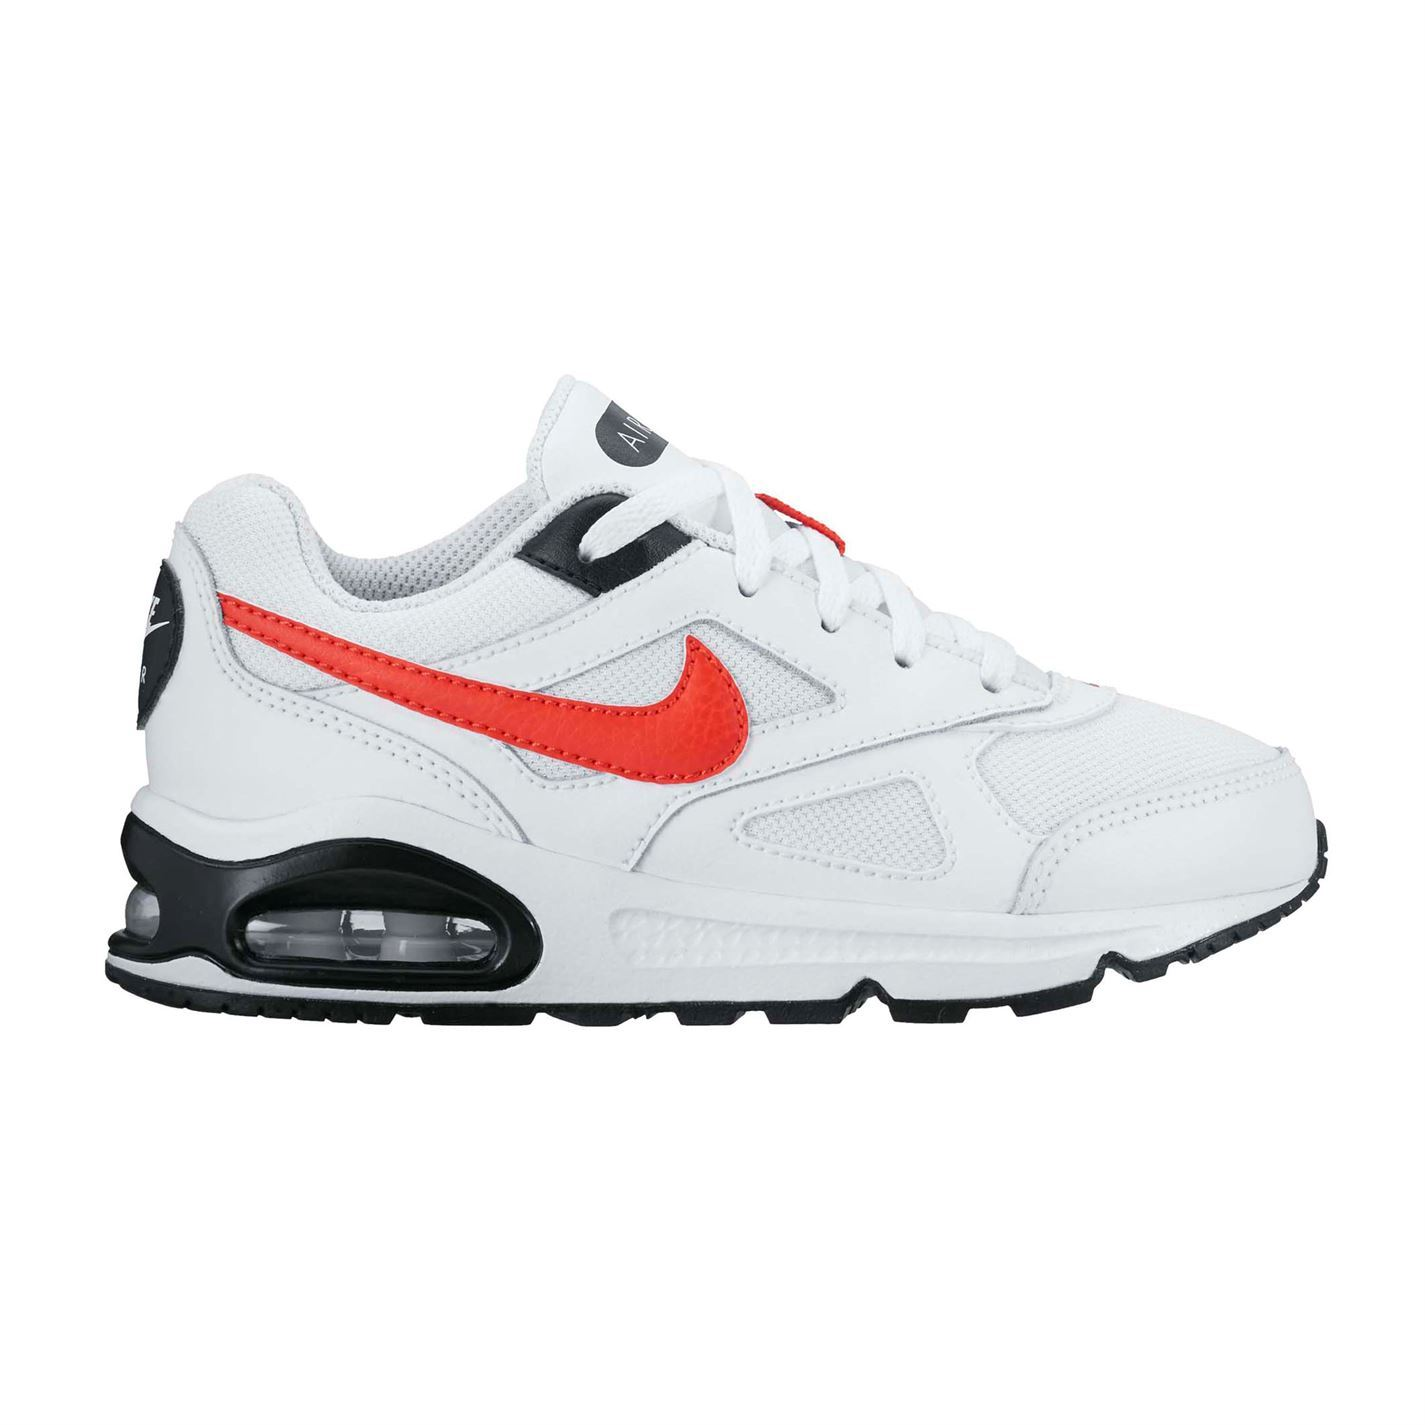 c9a2fb28ec330b Nike Air Max Ivo Child Boys Trainers Shoes Footwear